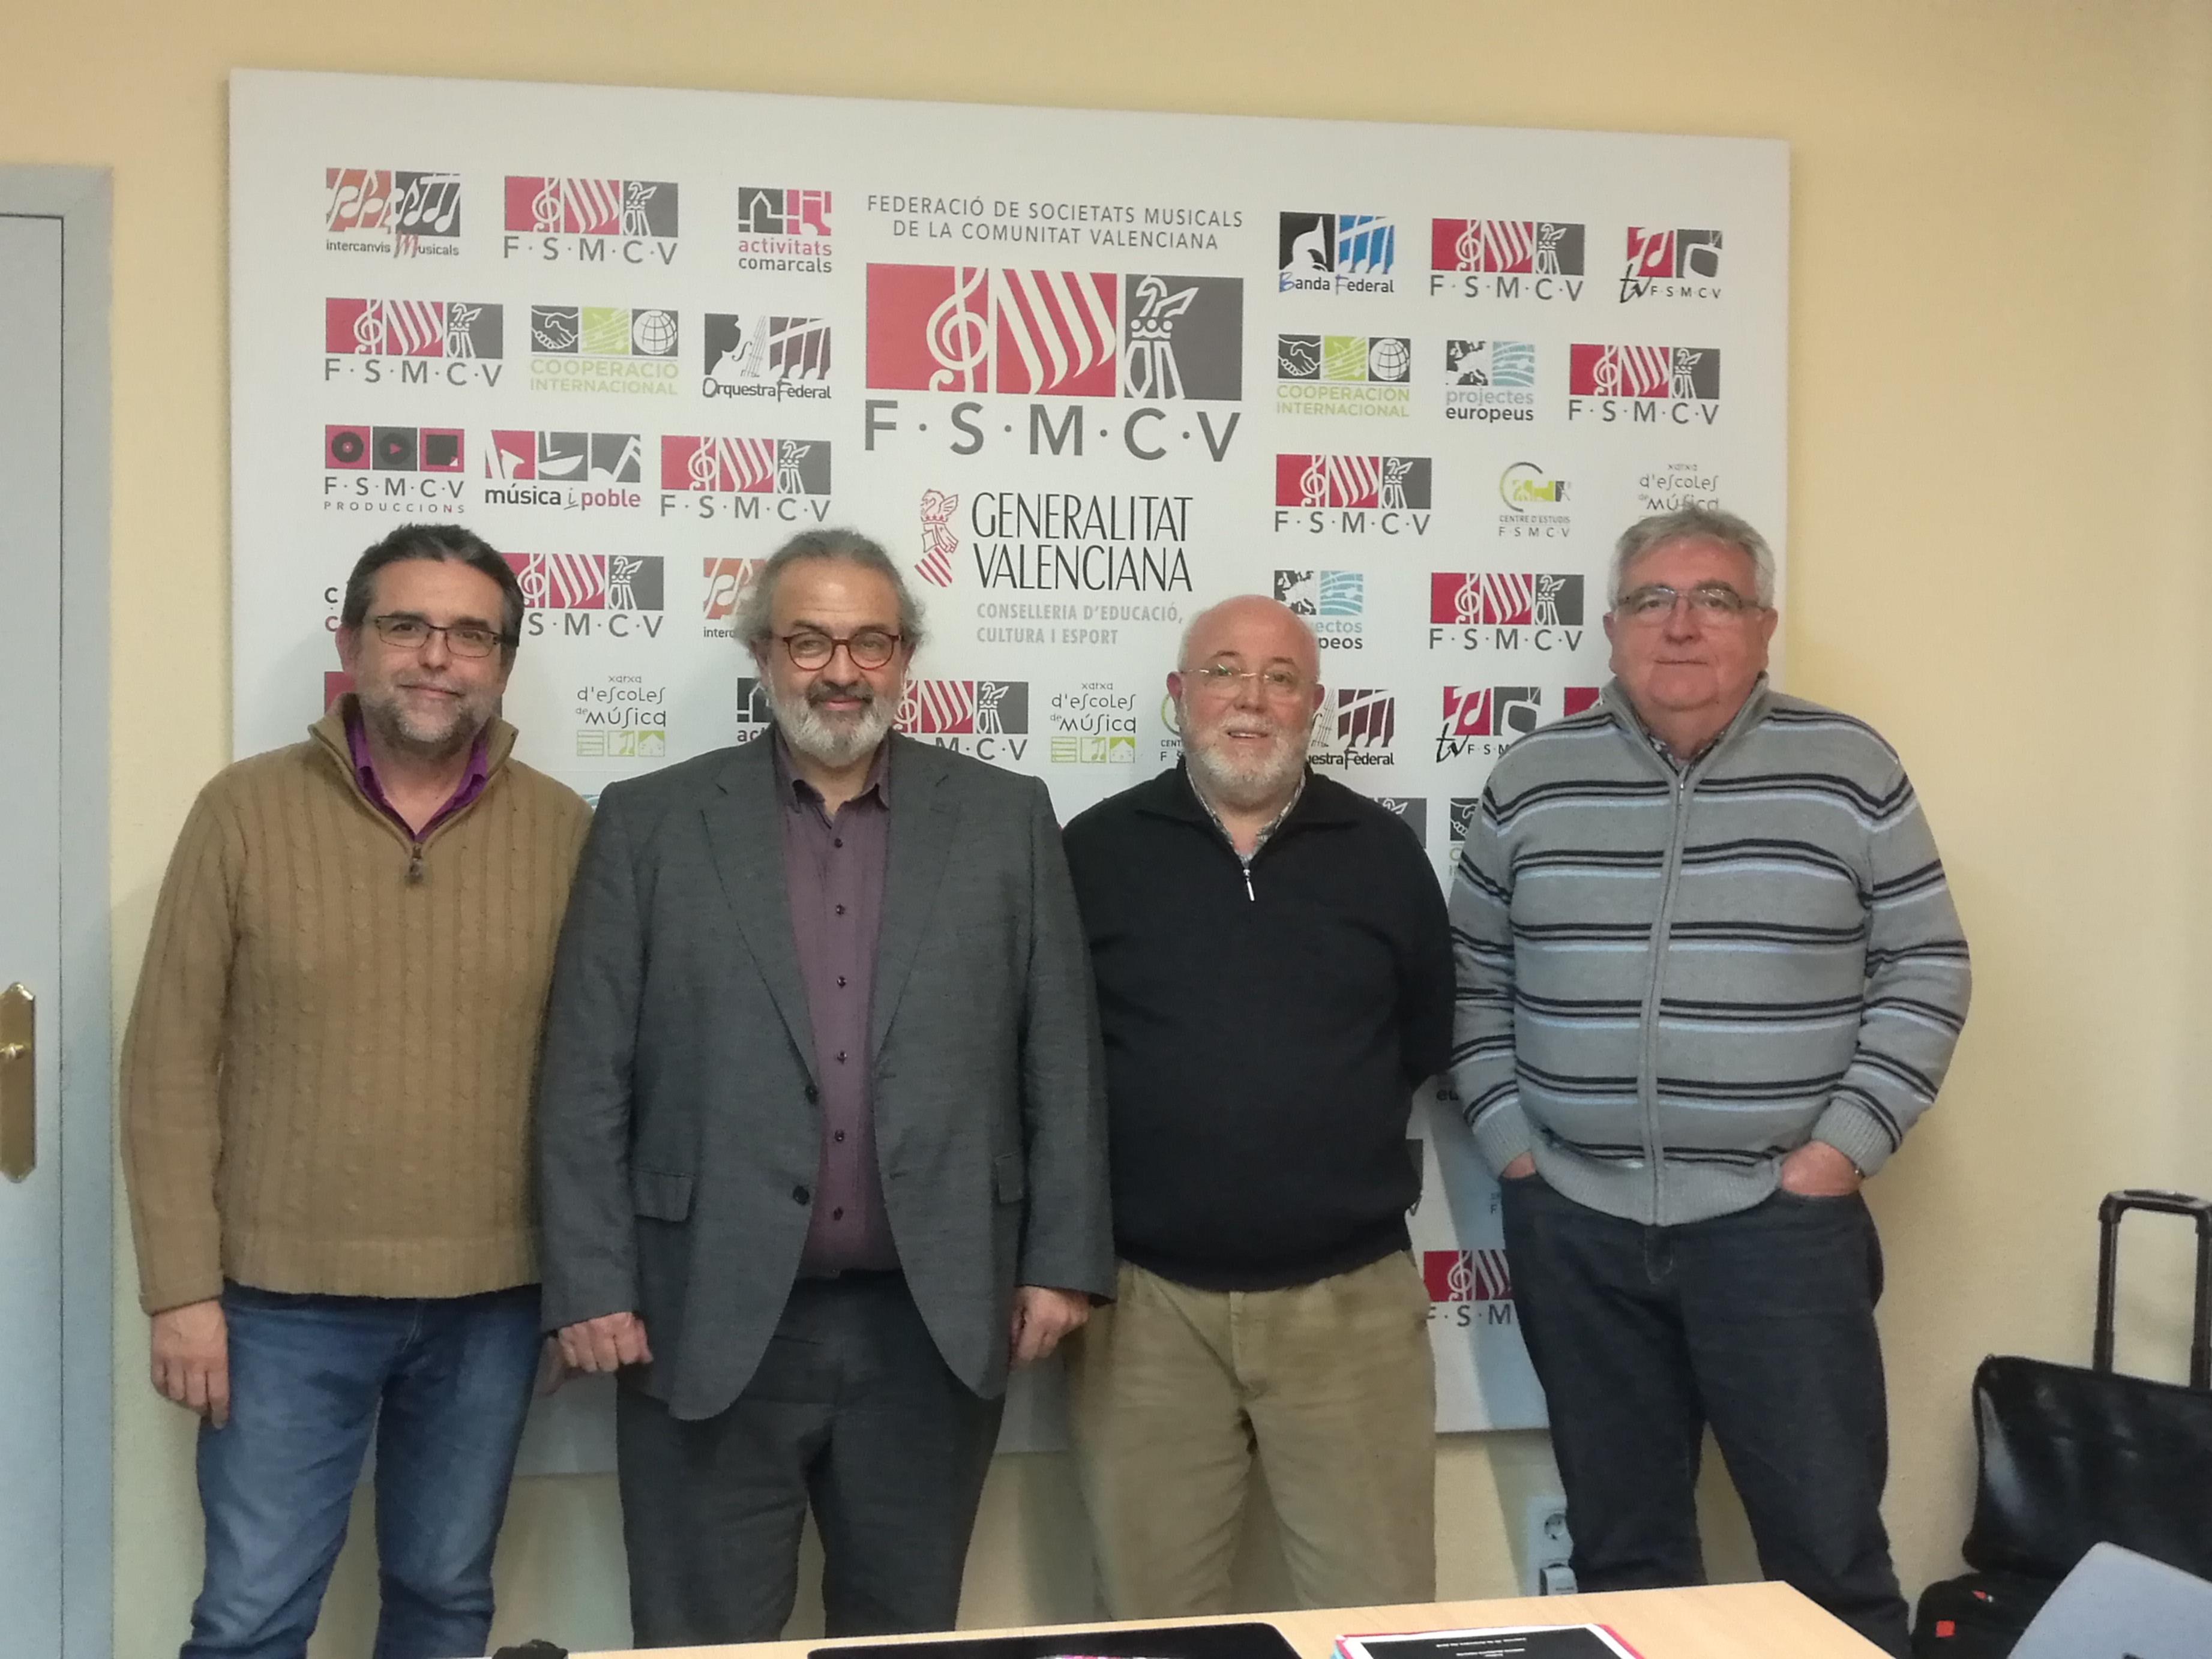 José Ramon Peinado, Presidente de la FFCV, Pedro Rodríguez, Presidente de la FSMCV, Juanjo Trilles, Presidente de la FVDIT y Manuel Pérez, Vicepresidente de FECOCOVA.